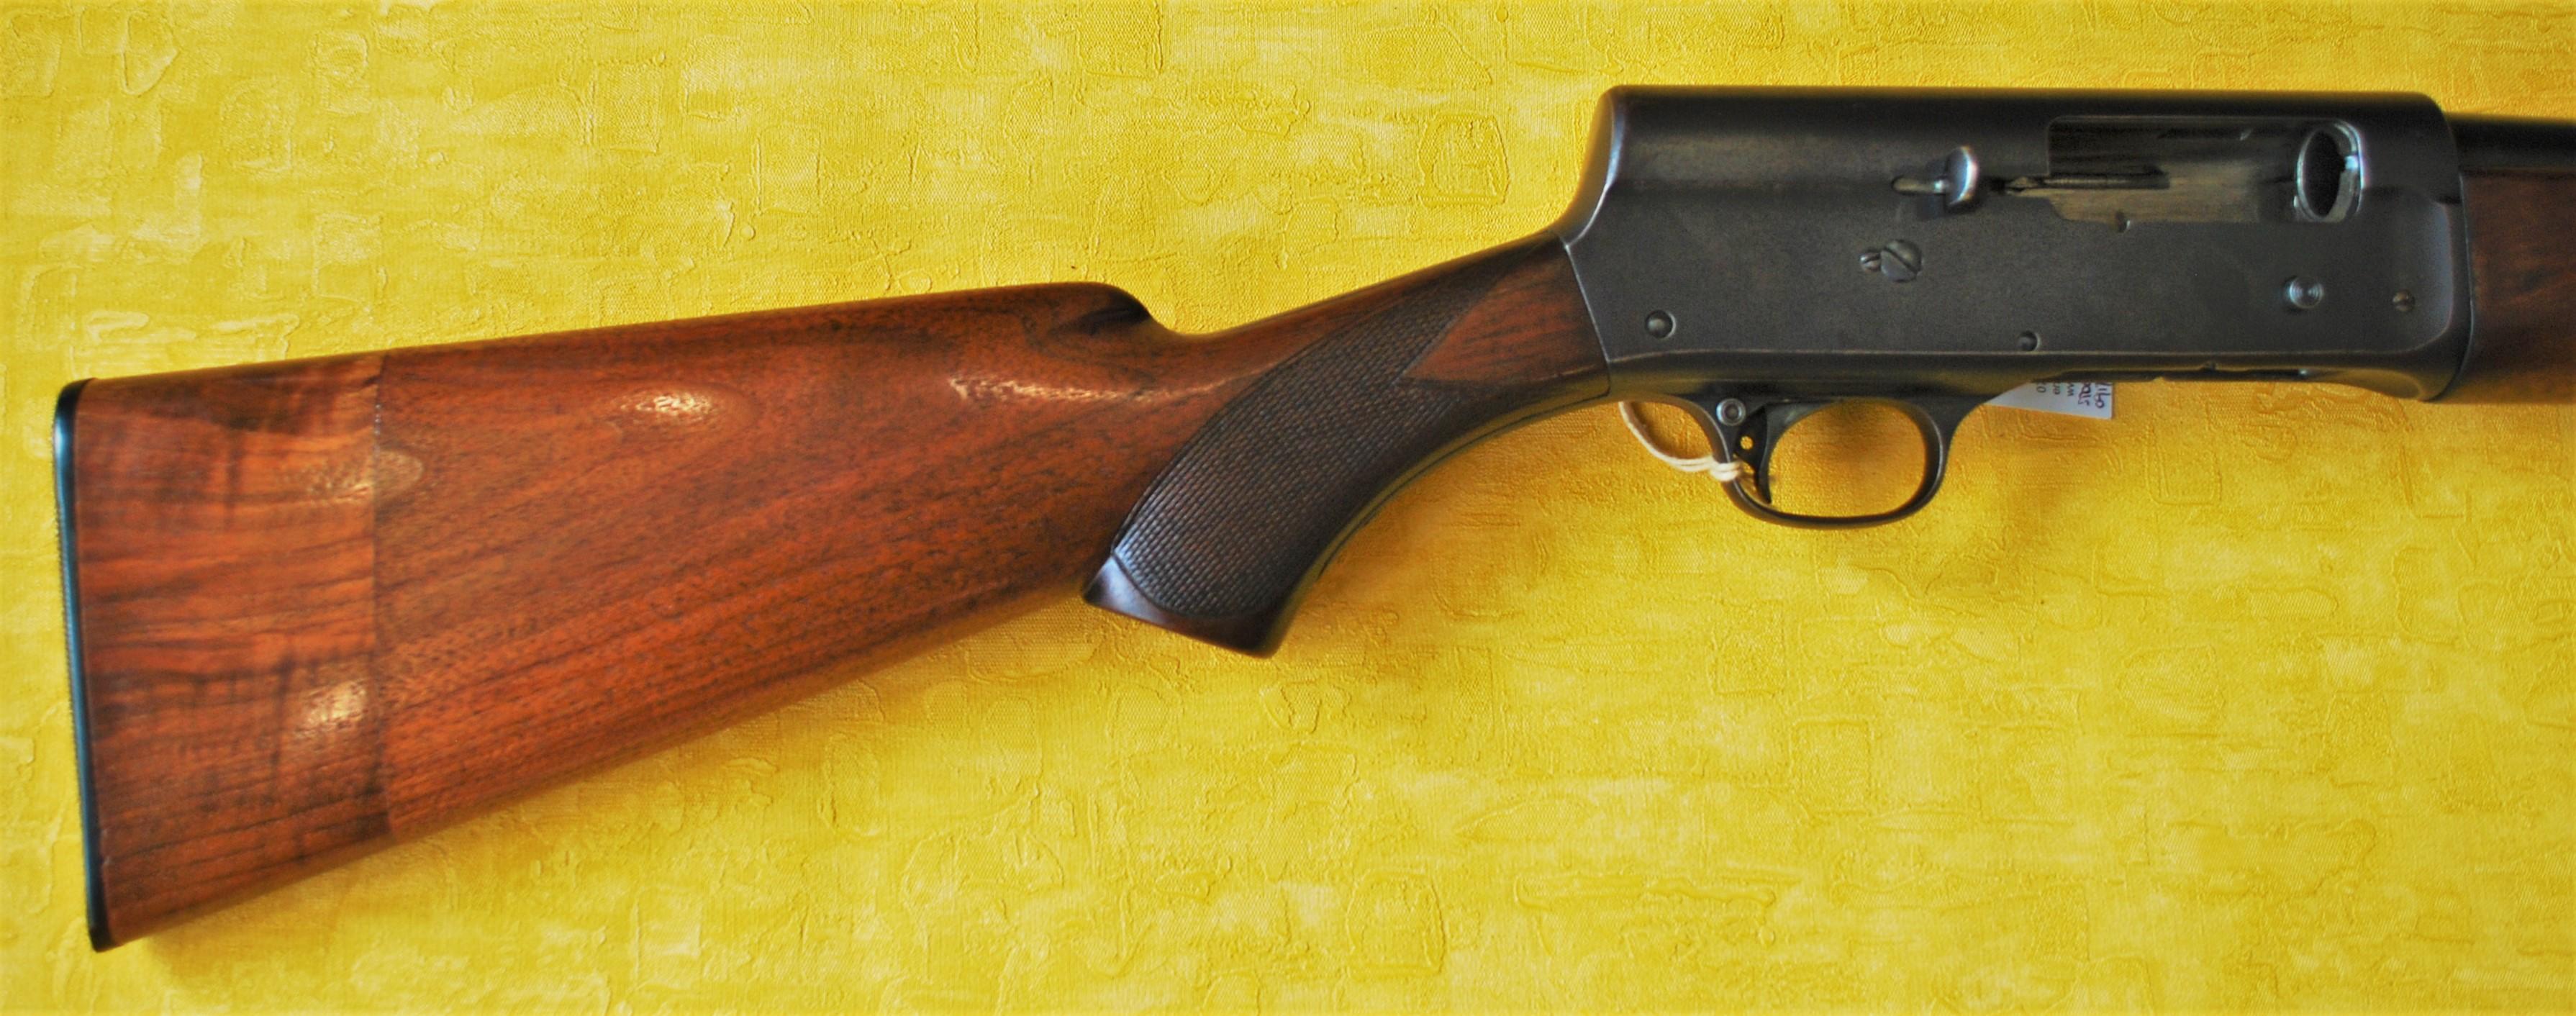 Shotgun history remington semi auto Gangster Gun: